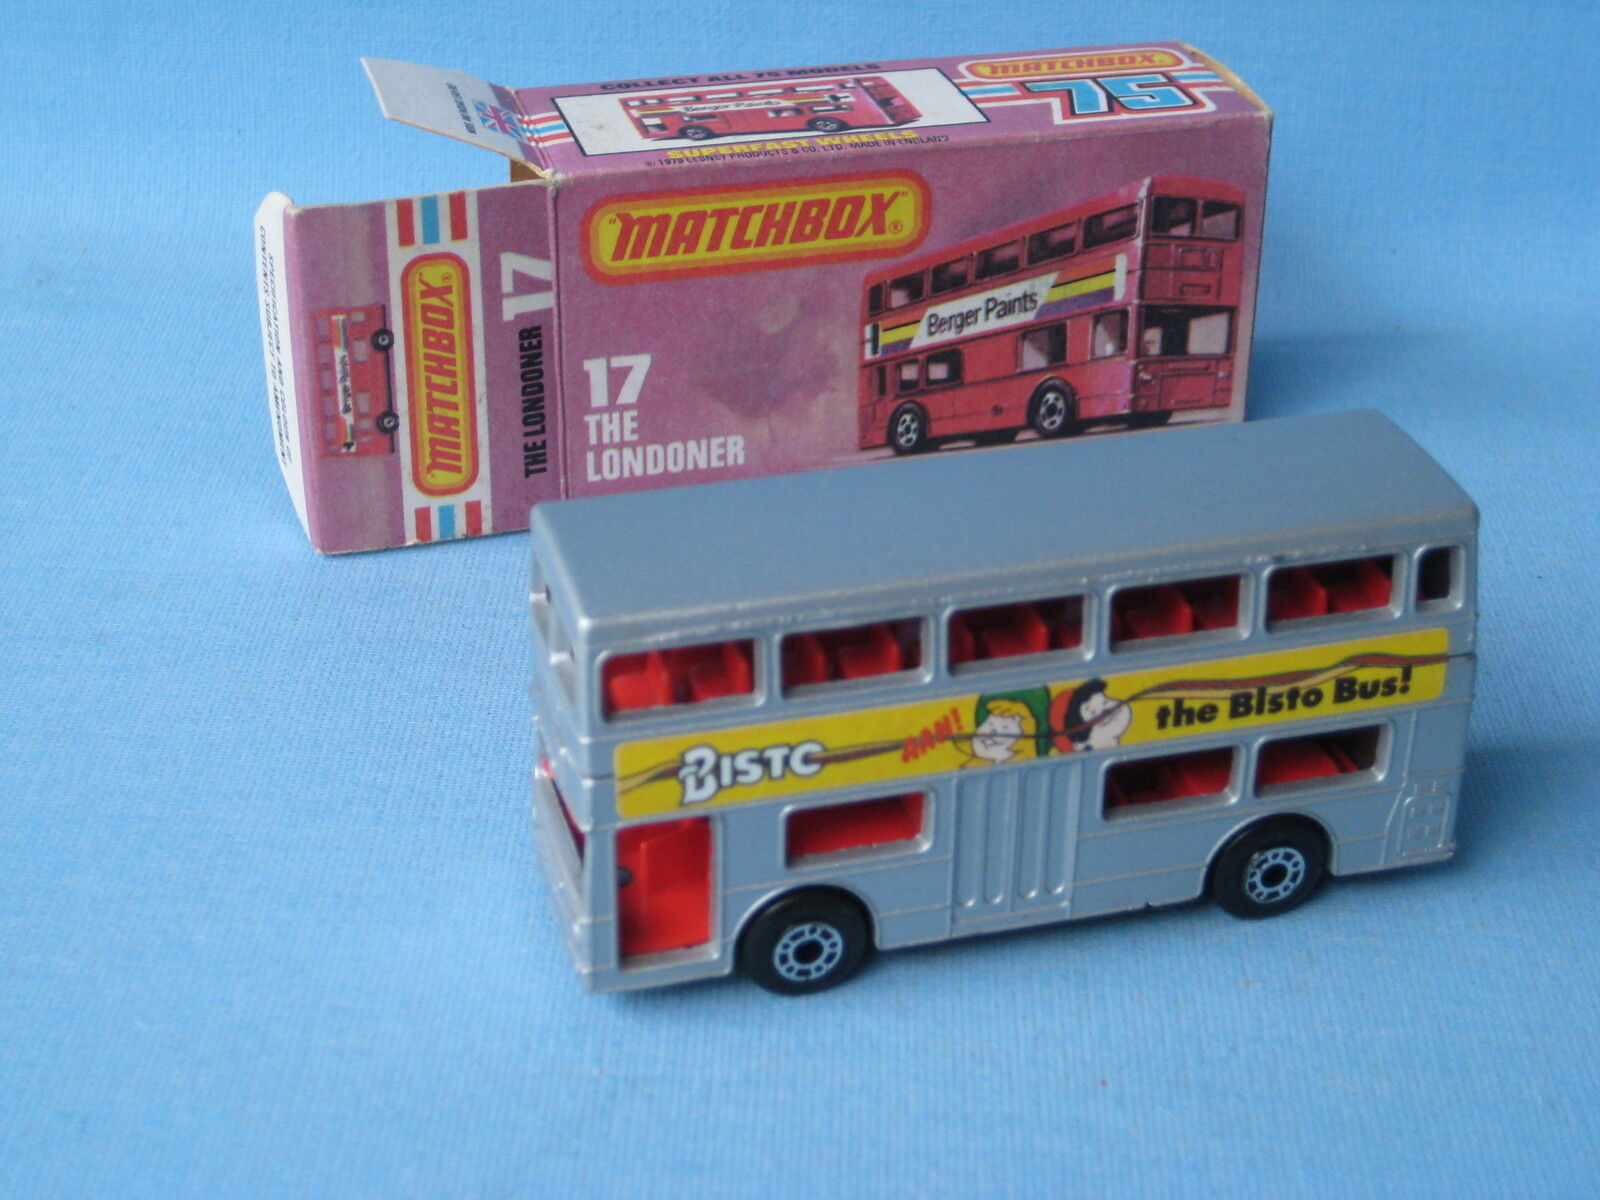 Matchbox SF-17 londinense Bus plata Cuerpo Bisto etiquetas Raro Y En Caja